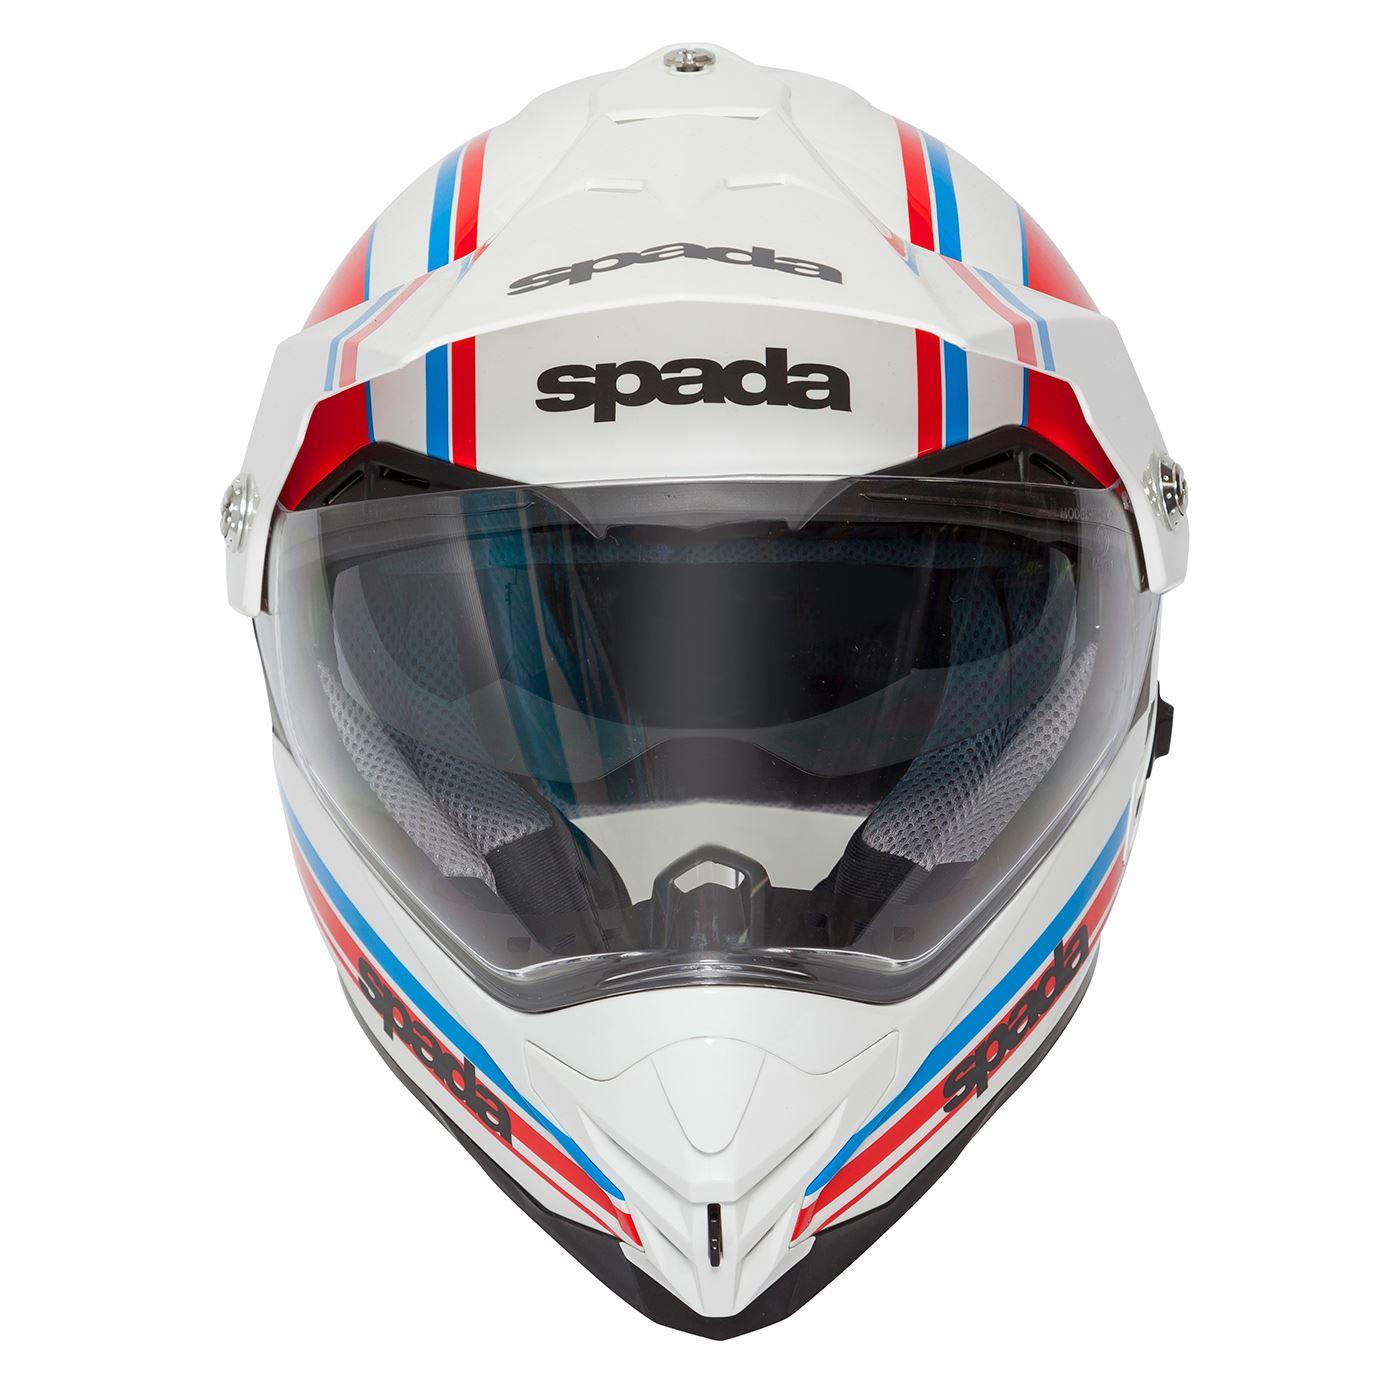 Spada-Intrepid-Full-Face-Motorcycle-Off-Road-Adventure-Style-Helmet-Sun-Visor thumbnail 28